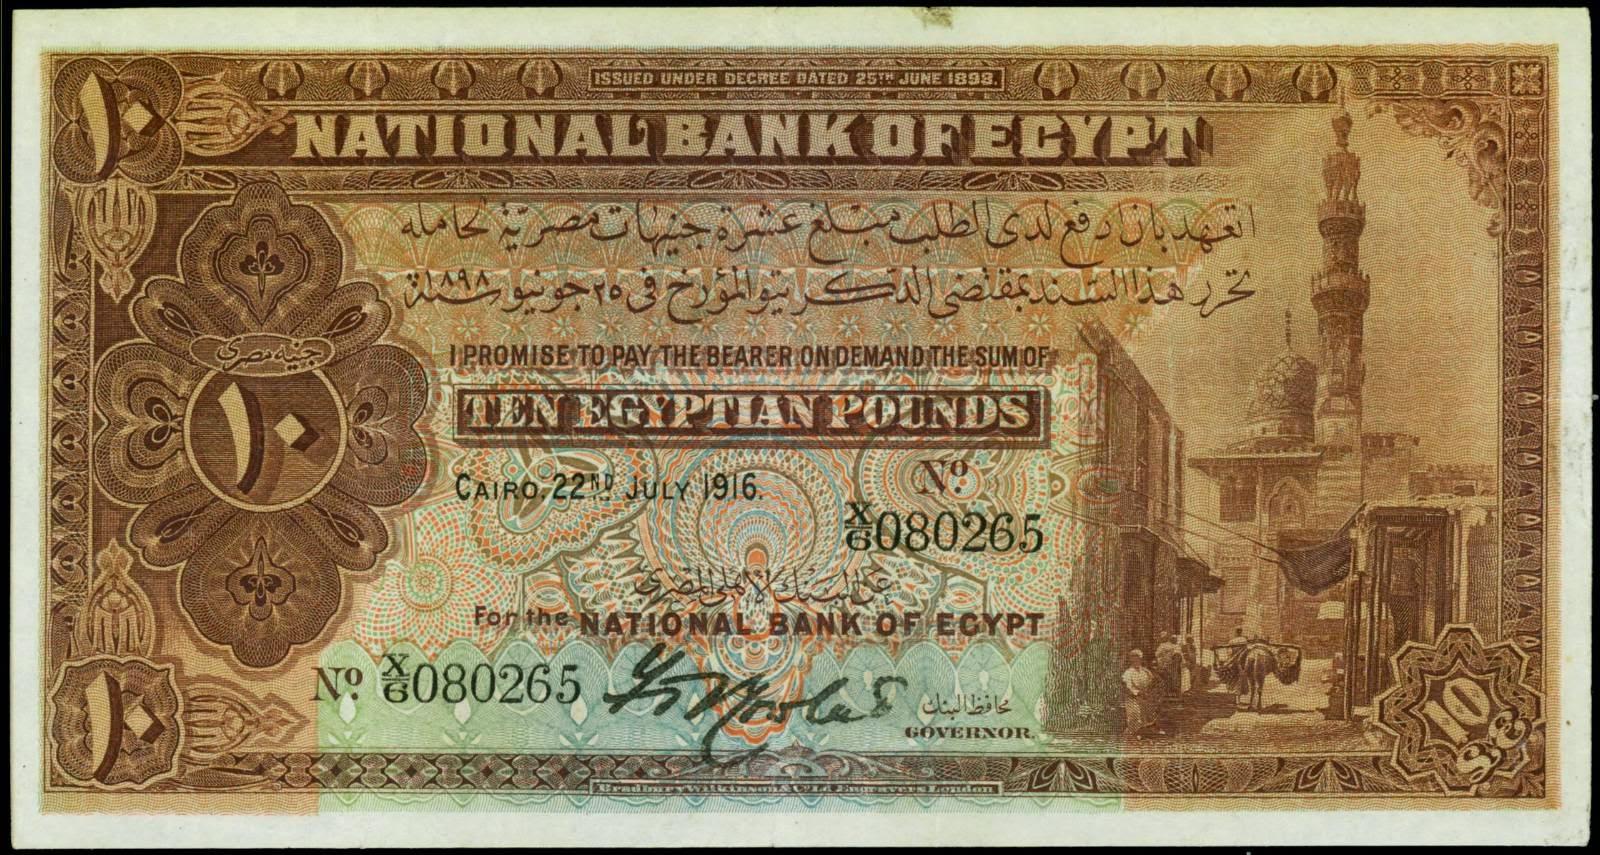 Egypt banknotes 10 Egyptian Pounds note 1916